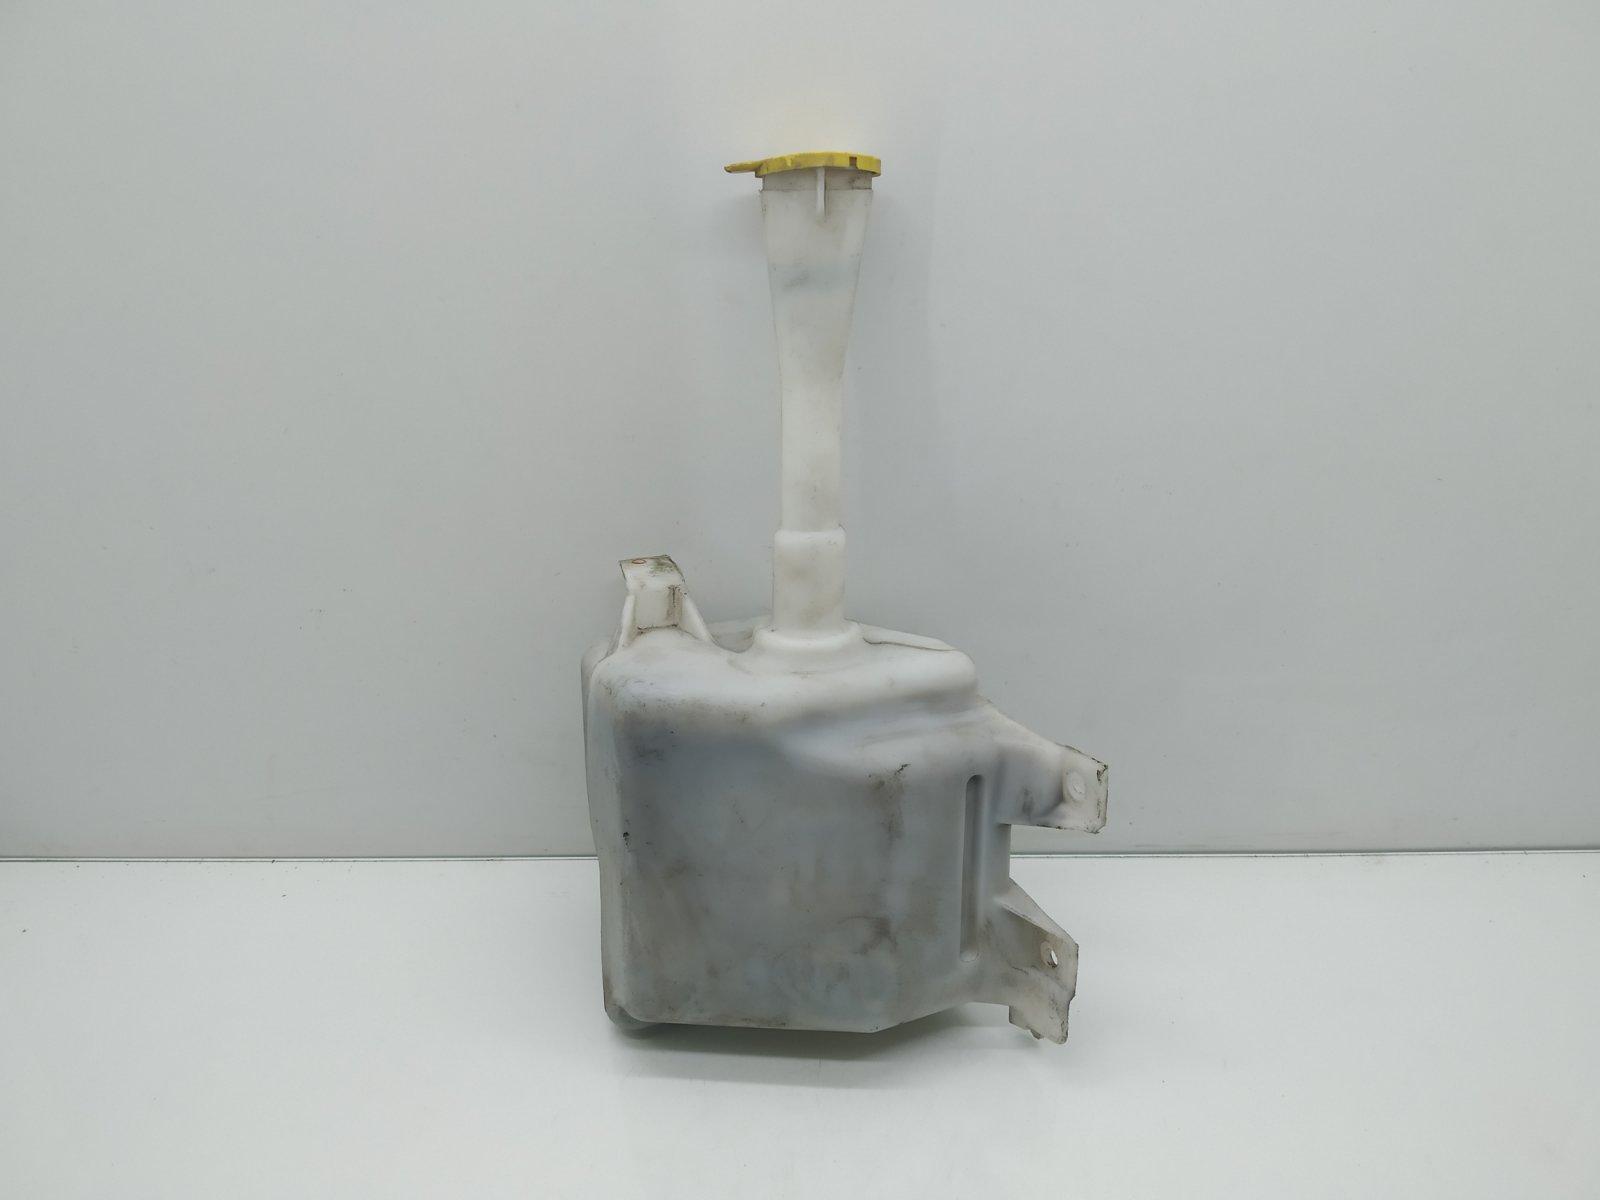 Бачок омывателя Nissan Almera N16 1.8 I 2005 (б/у)